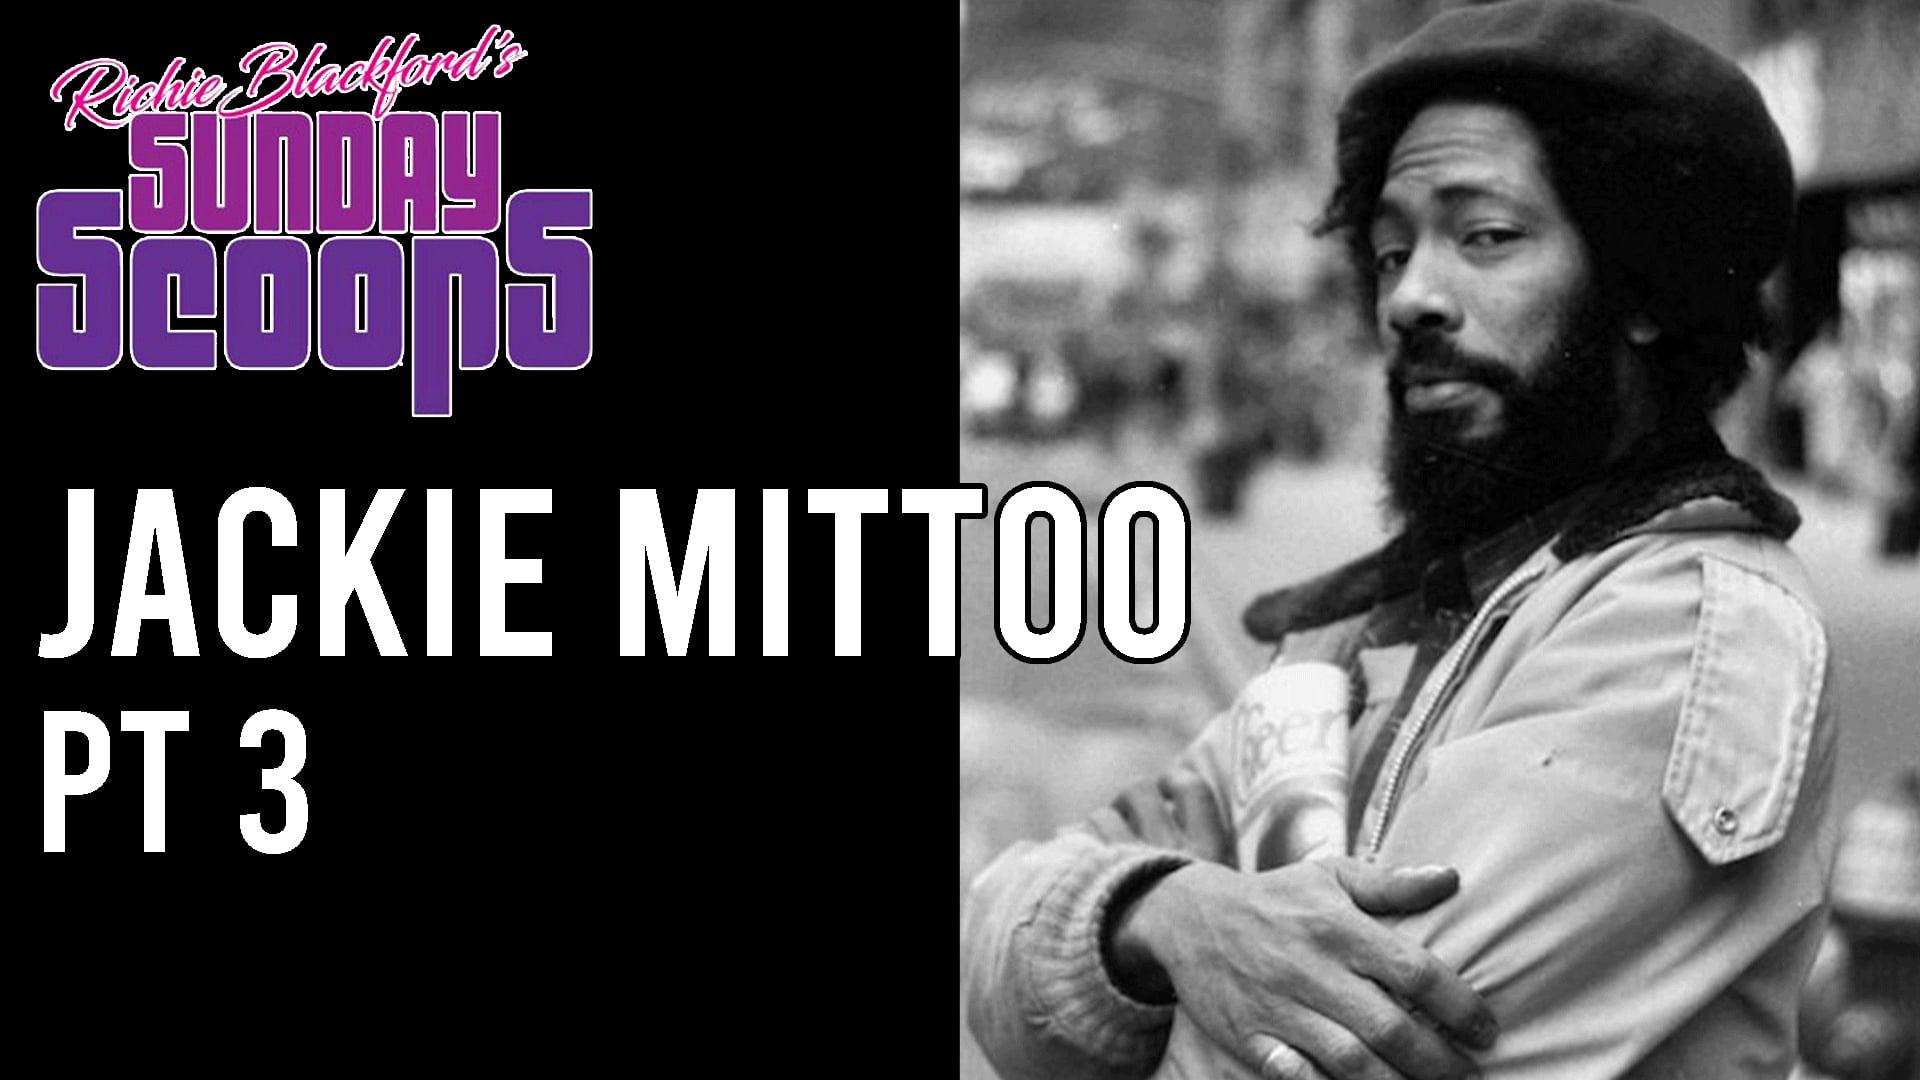 Sunday Scoops - Jackie Mittoo Pt 3